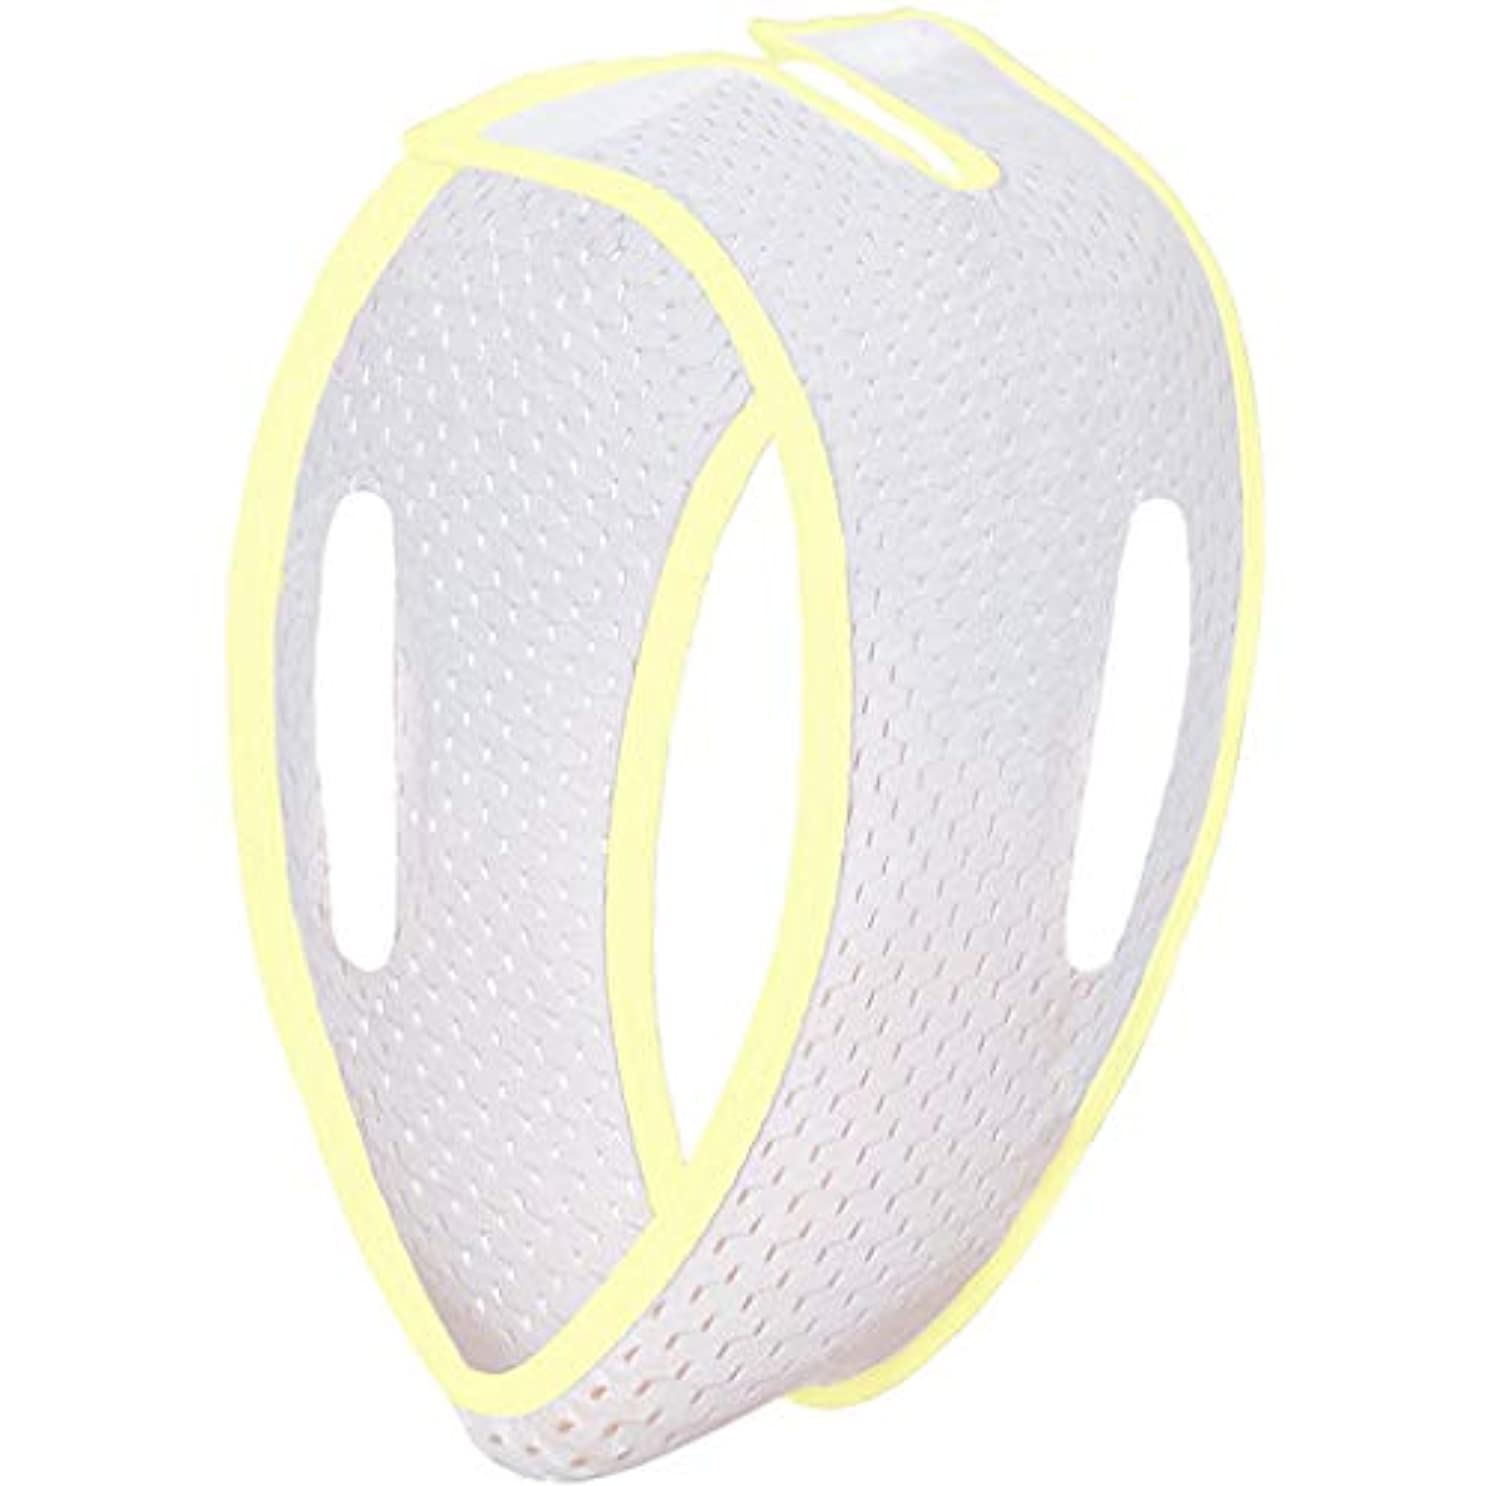 Jia He 軽量 薄い顔ベルト、V顔薄い顔包帯超薄型アンチリンクルリフティングファーミングチン通気性マスク ## (Color : White and Yellow)